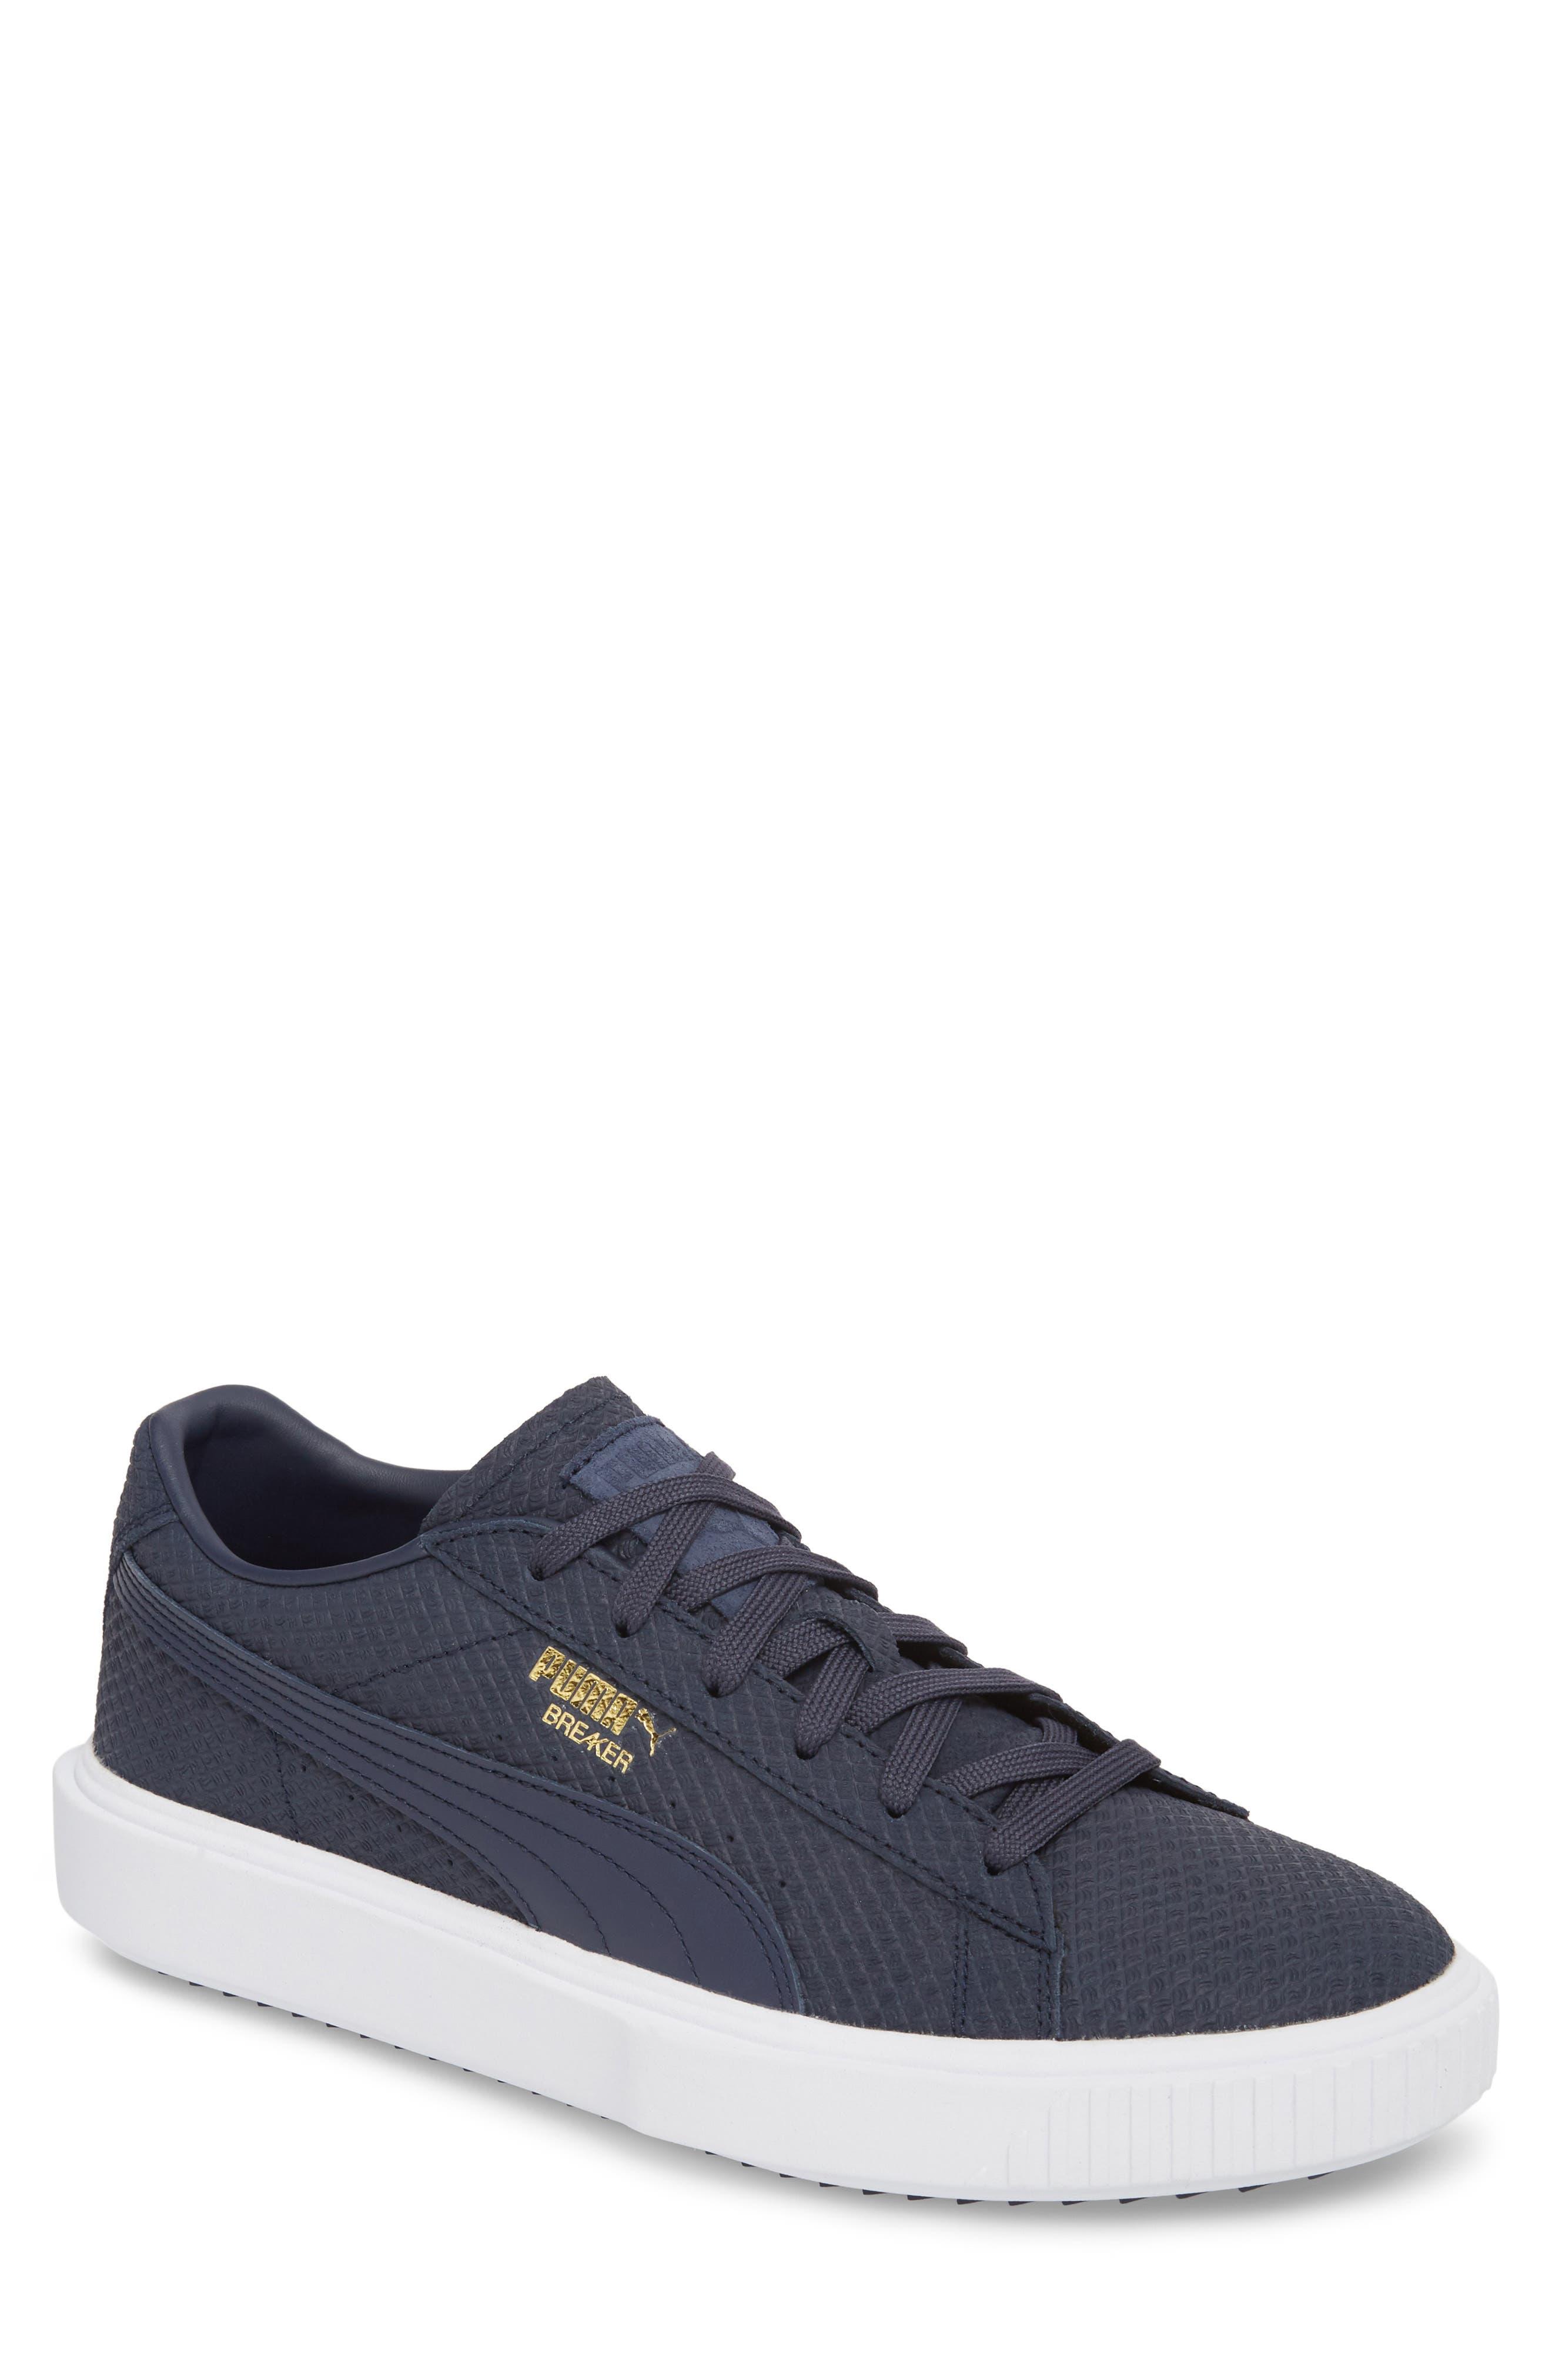 Breaker Suede Sneaker, Main, color, 400